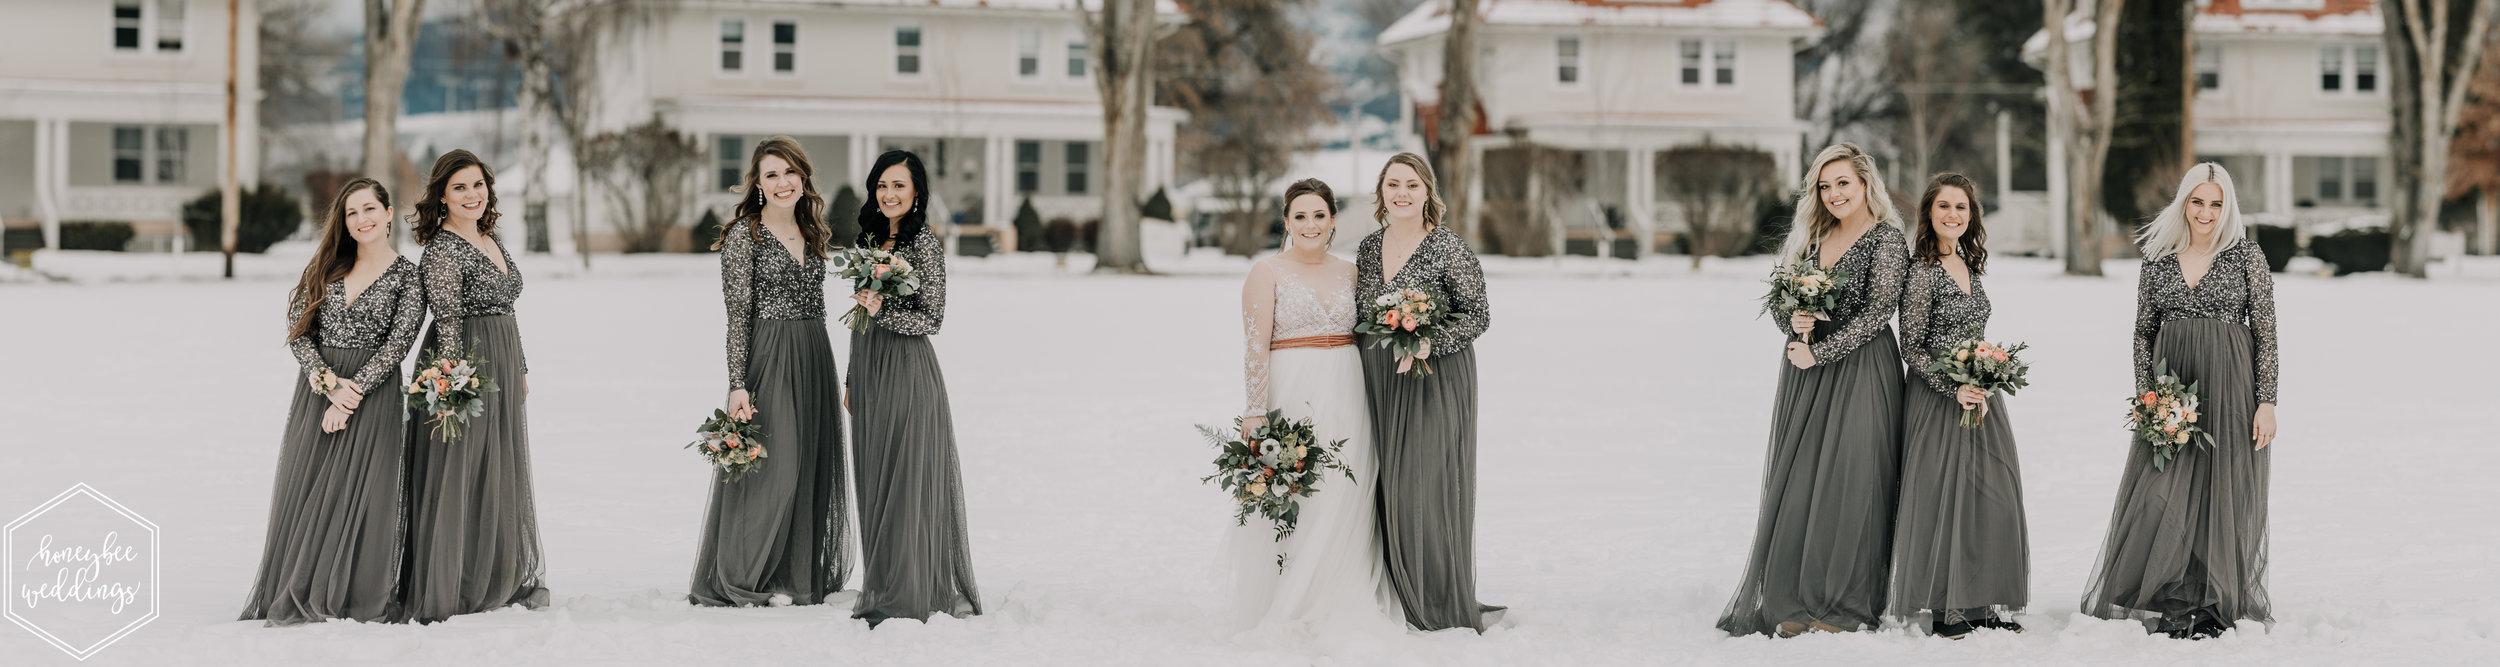 0204Montana Wedding Photographer_Montana winter wedding_Wedding at Fort Missoula_Meri & Carter_December 31, 2015-29-Pano.jpg